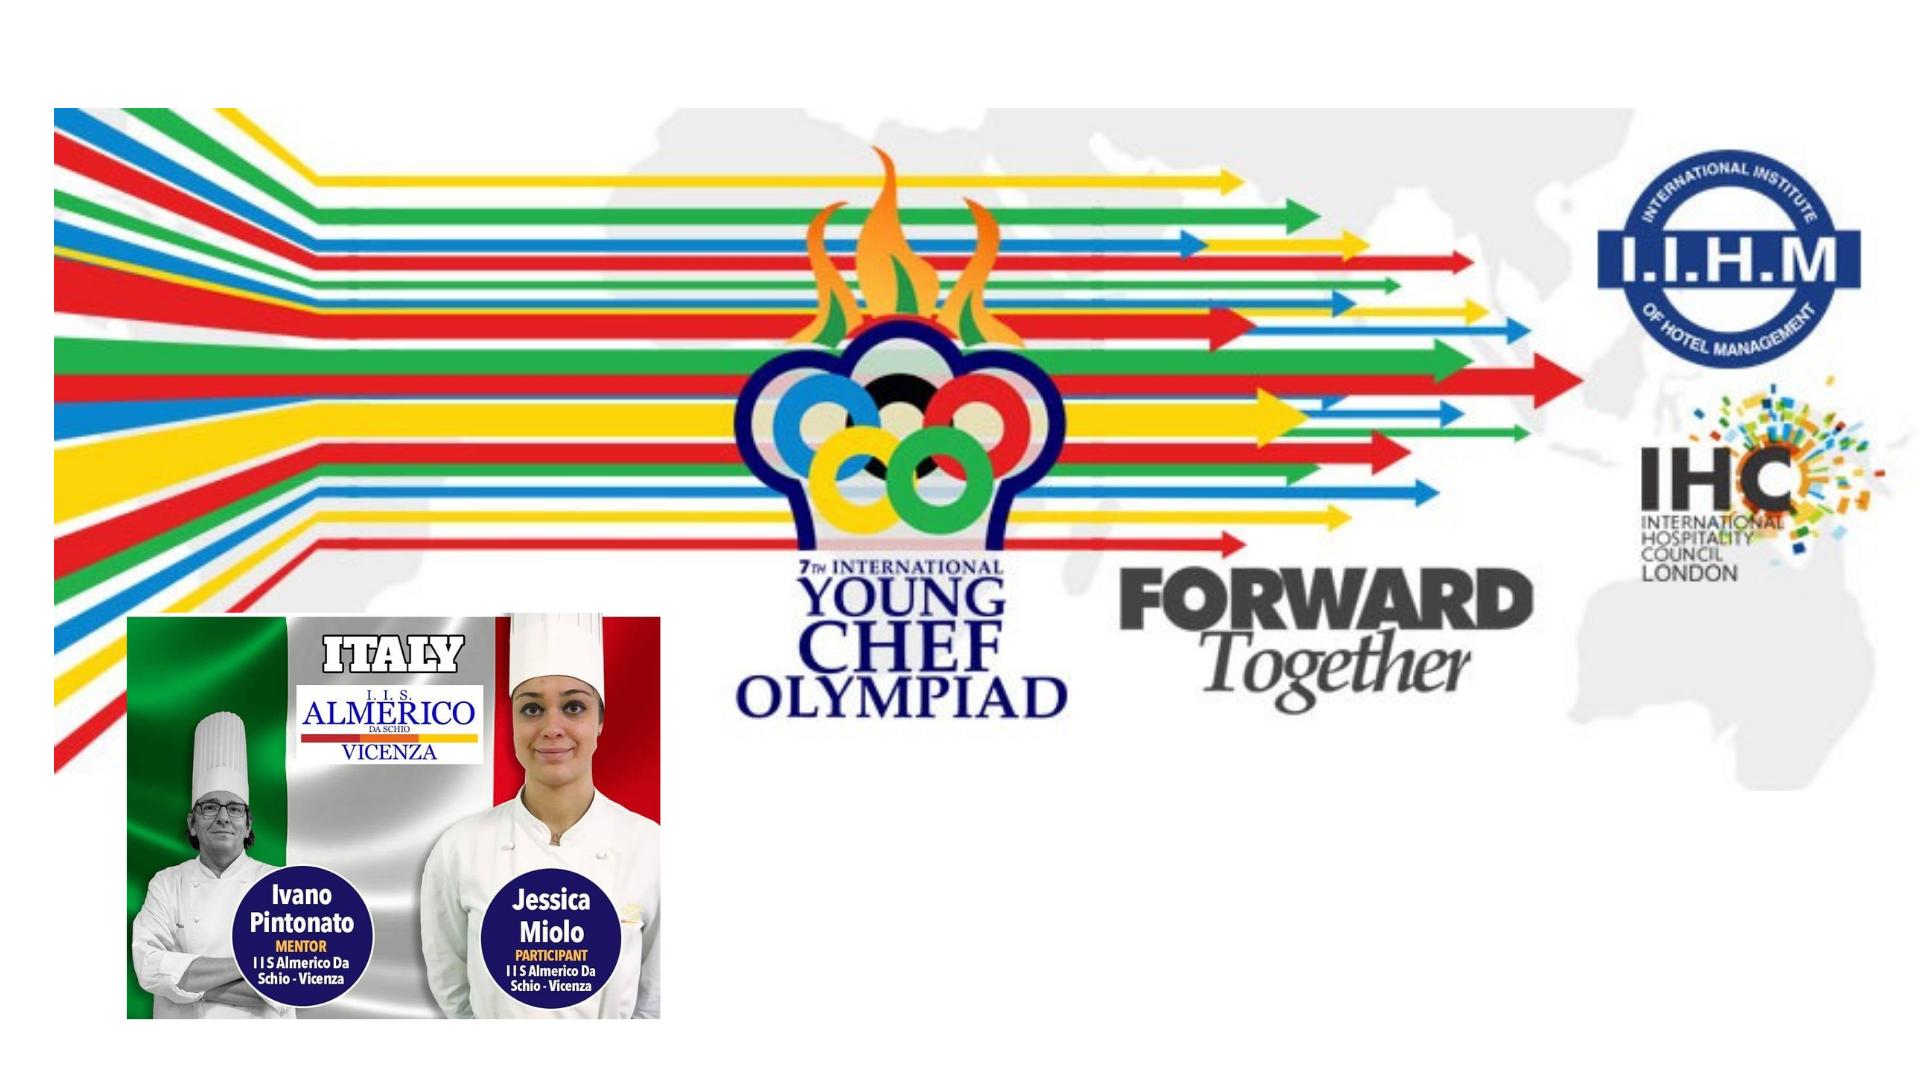 alle-young-chef-olympiad-2021-partecipa-jessica-miolo